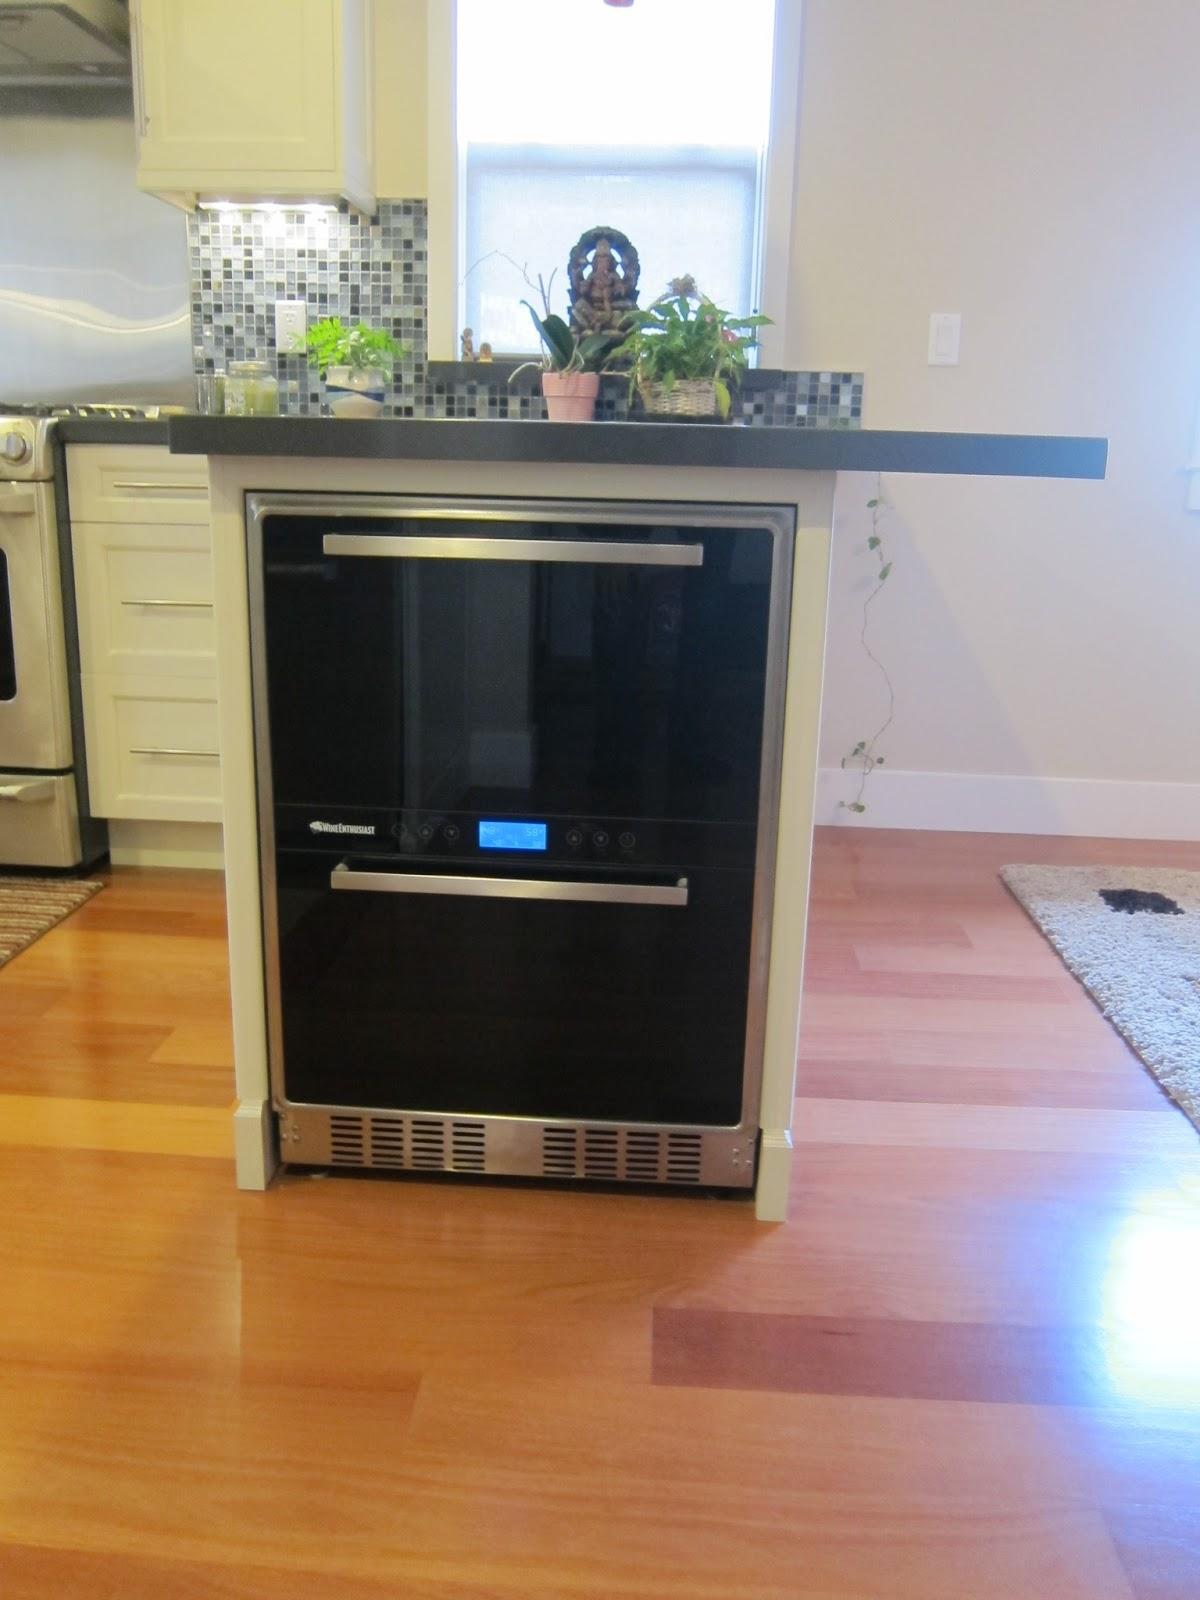 White Kitchen Cabinets, Quartz counter top, Farmer Sink, Glass